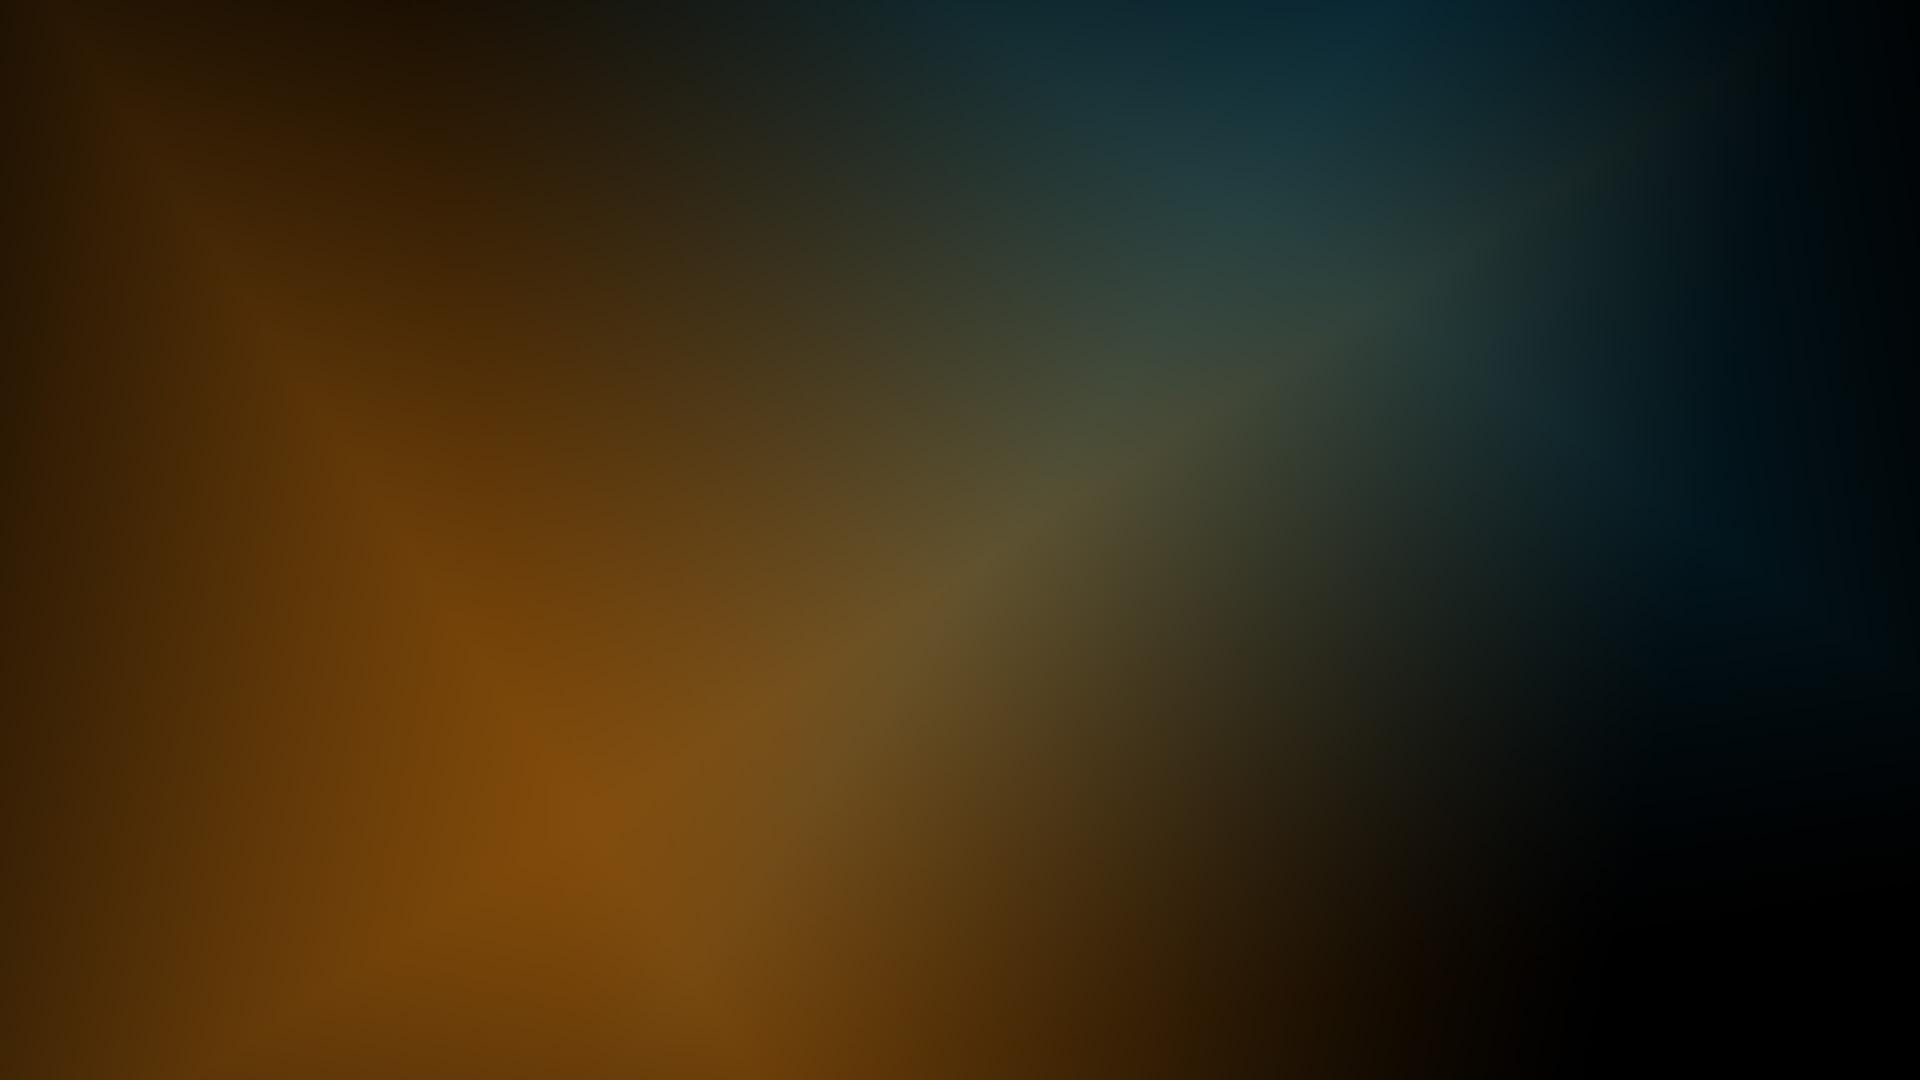 Basic orange and blue background by berethead on DeviantArt